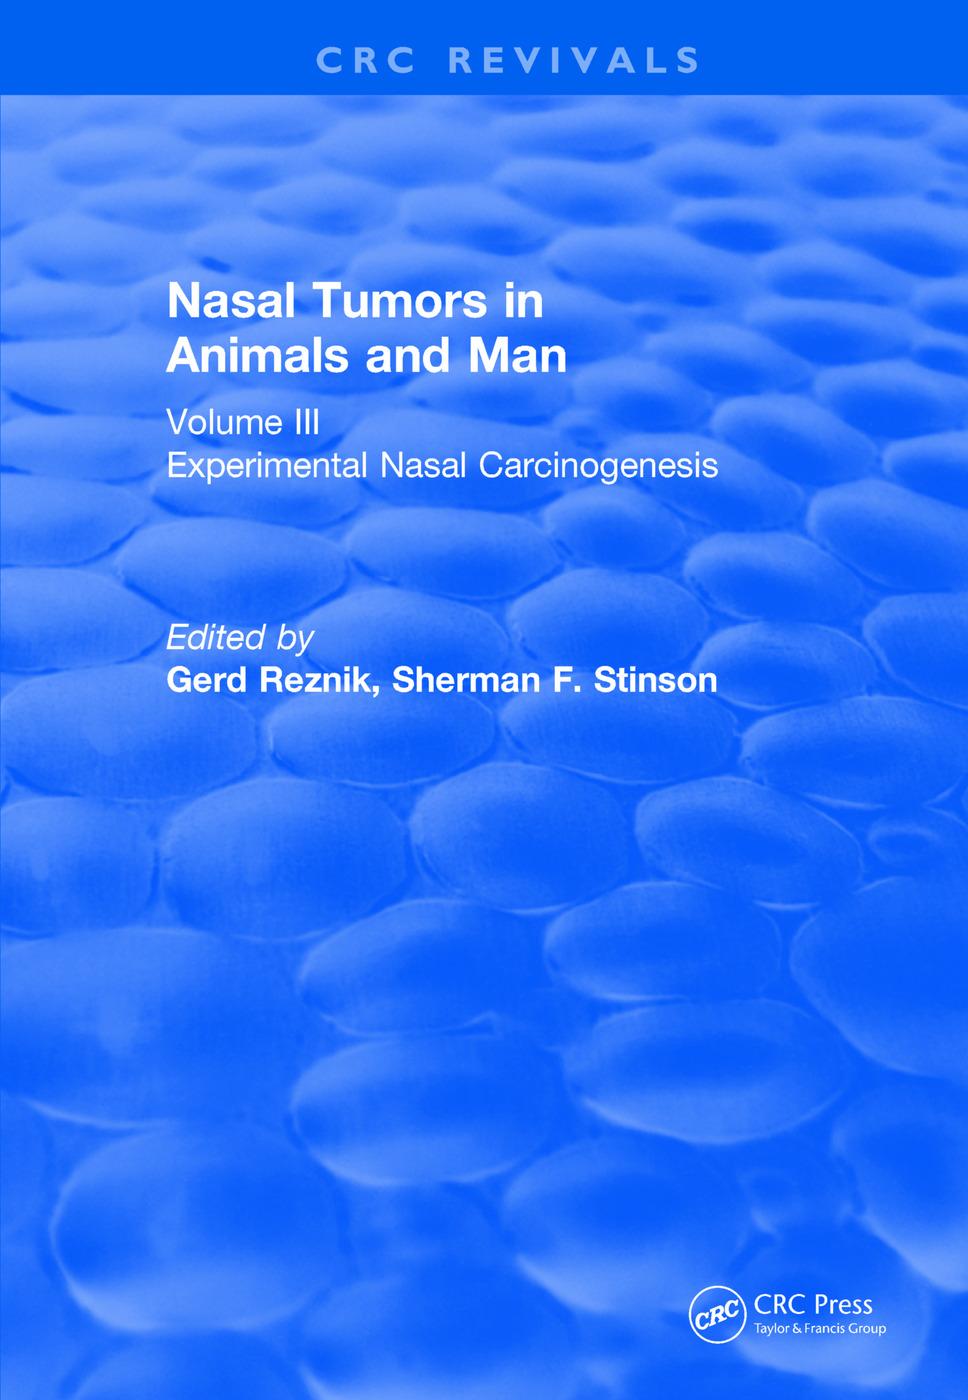 Revival: Nasal Tumors in Animals and Man Vol. III (1983): Experimental Nasal Carcinogenesis book cover